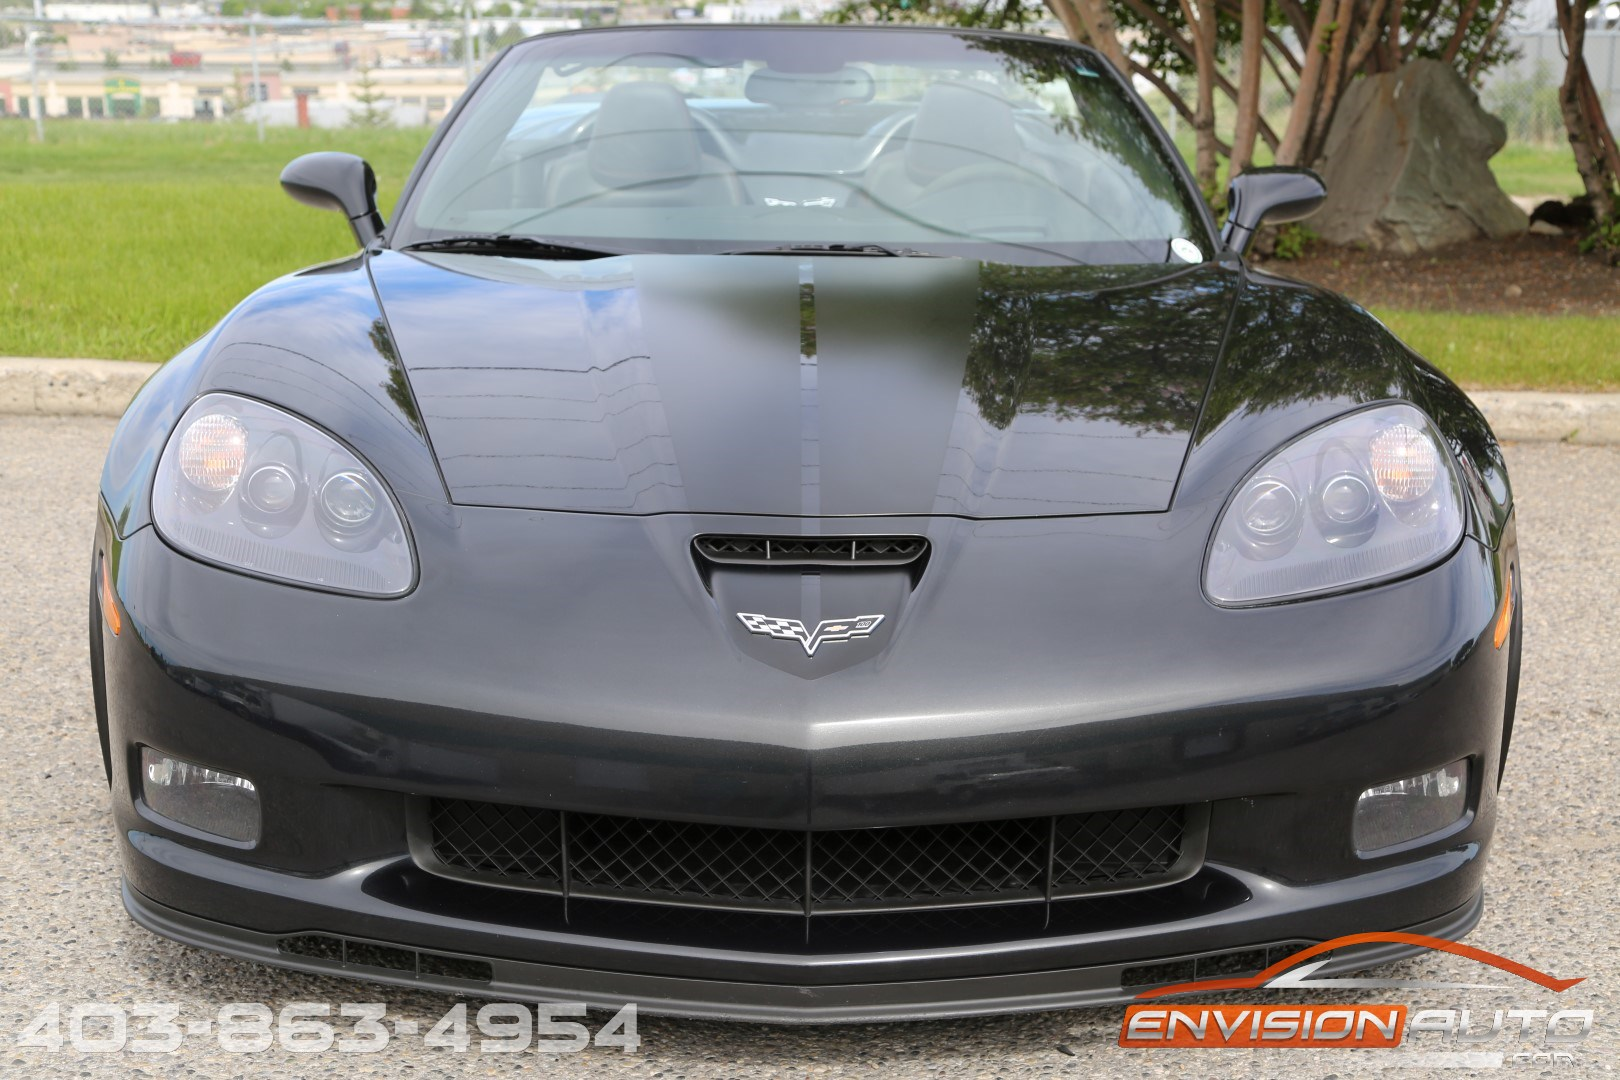 2012 chevrolet corvette grand sport convertible centennial edition envision auto calgary. Black Bedroom Furniture Sets. Home Design Ideas